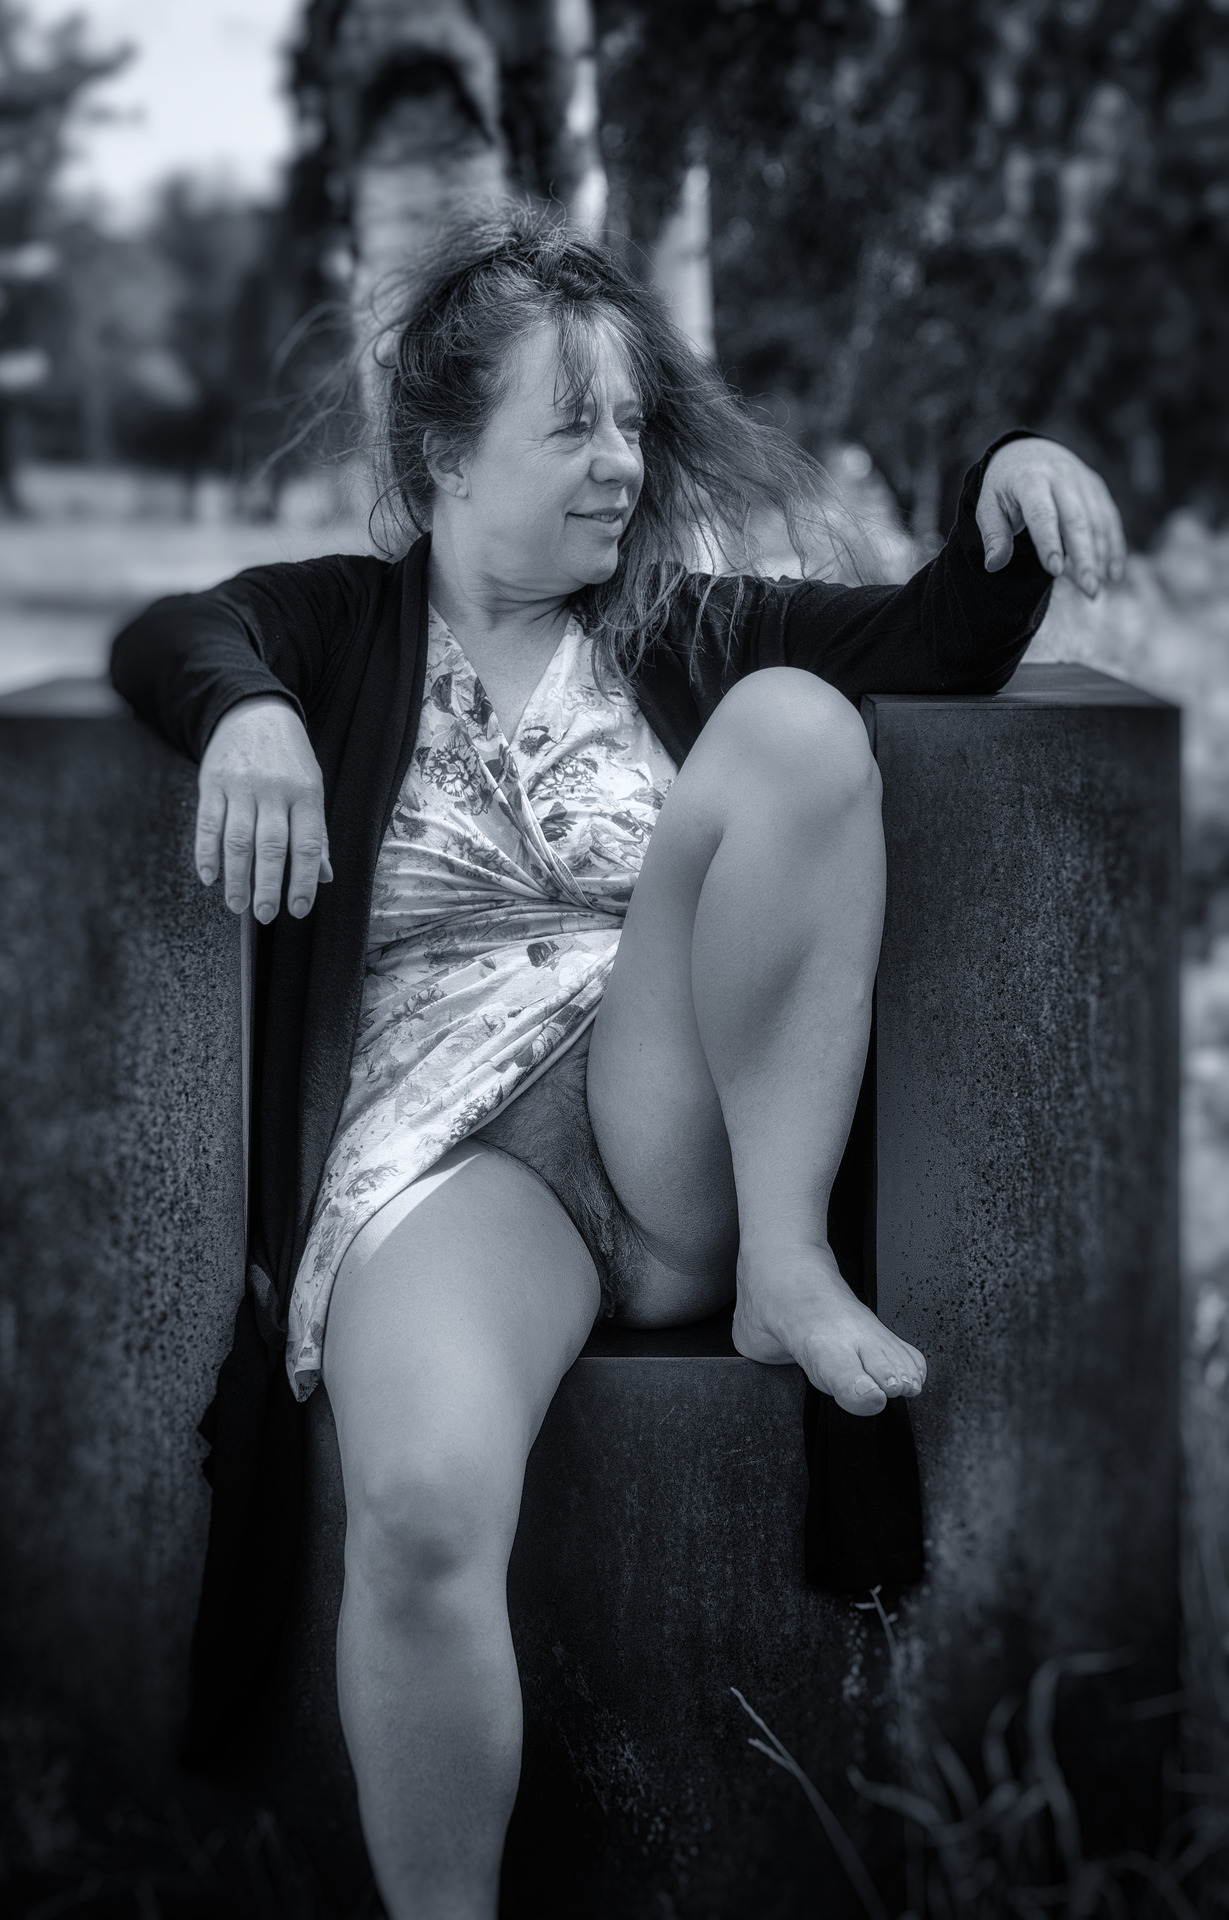 Halbnackte Frau sitzt auf Kunst-Sessel